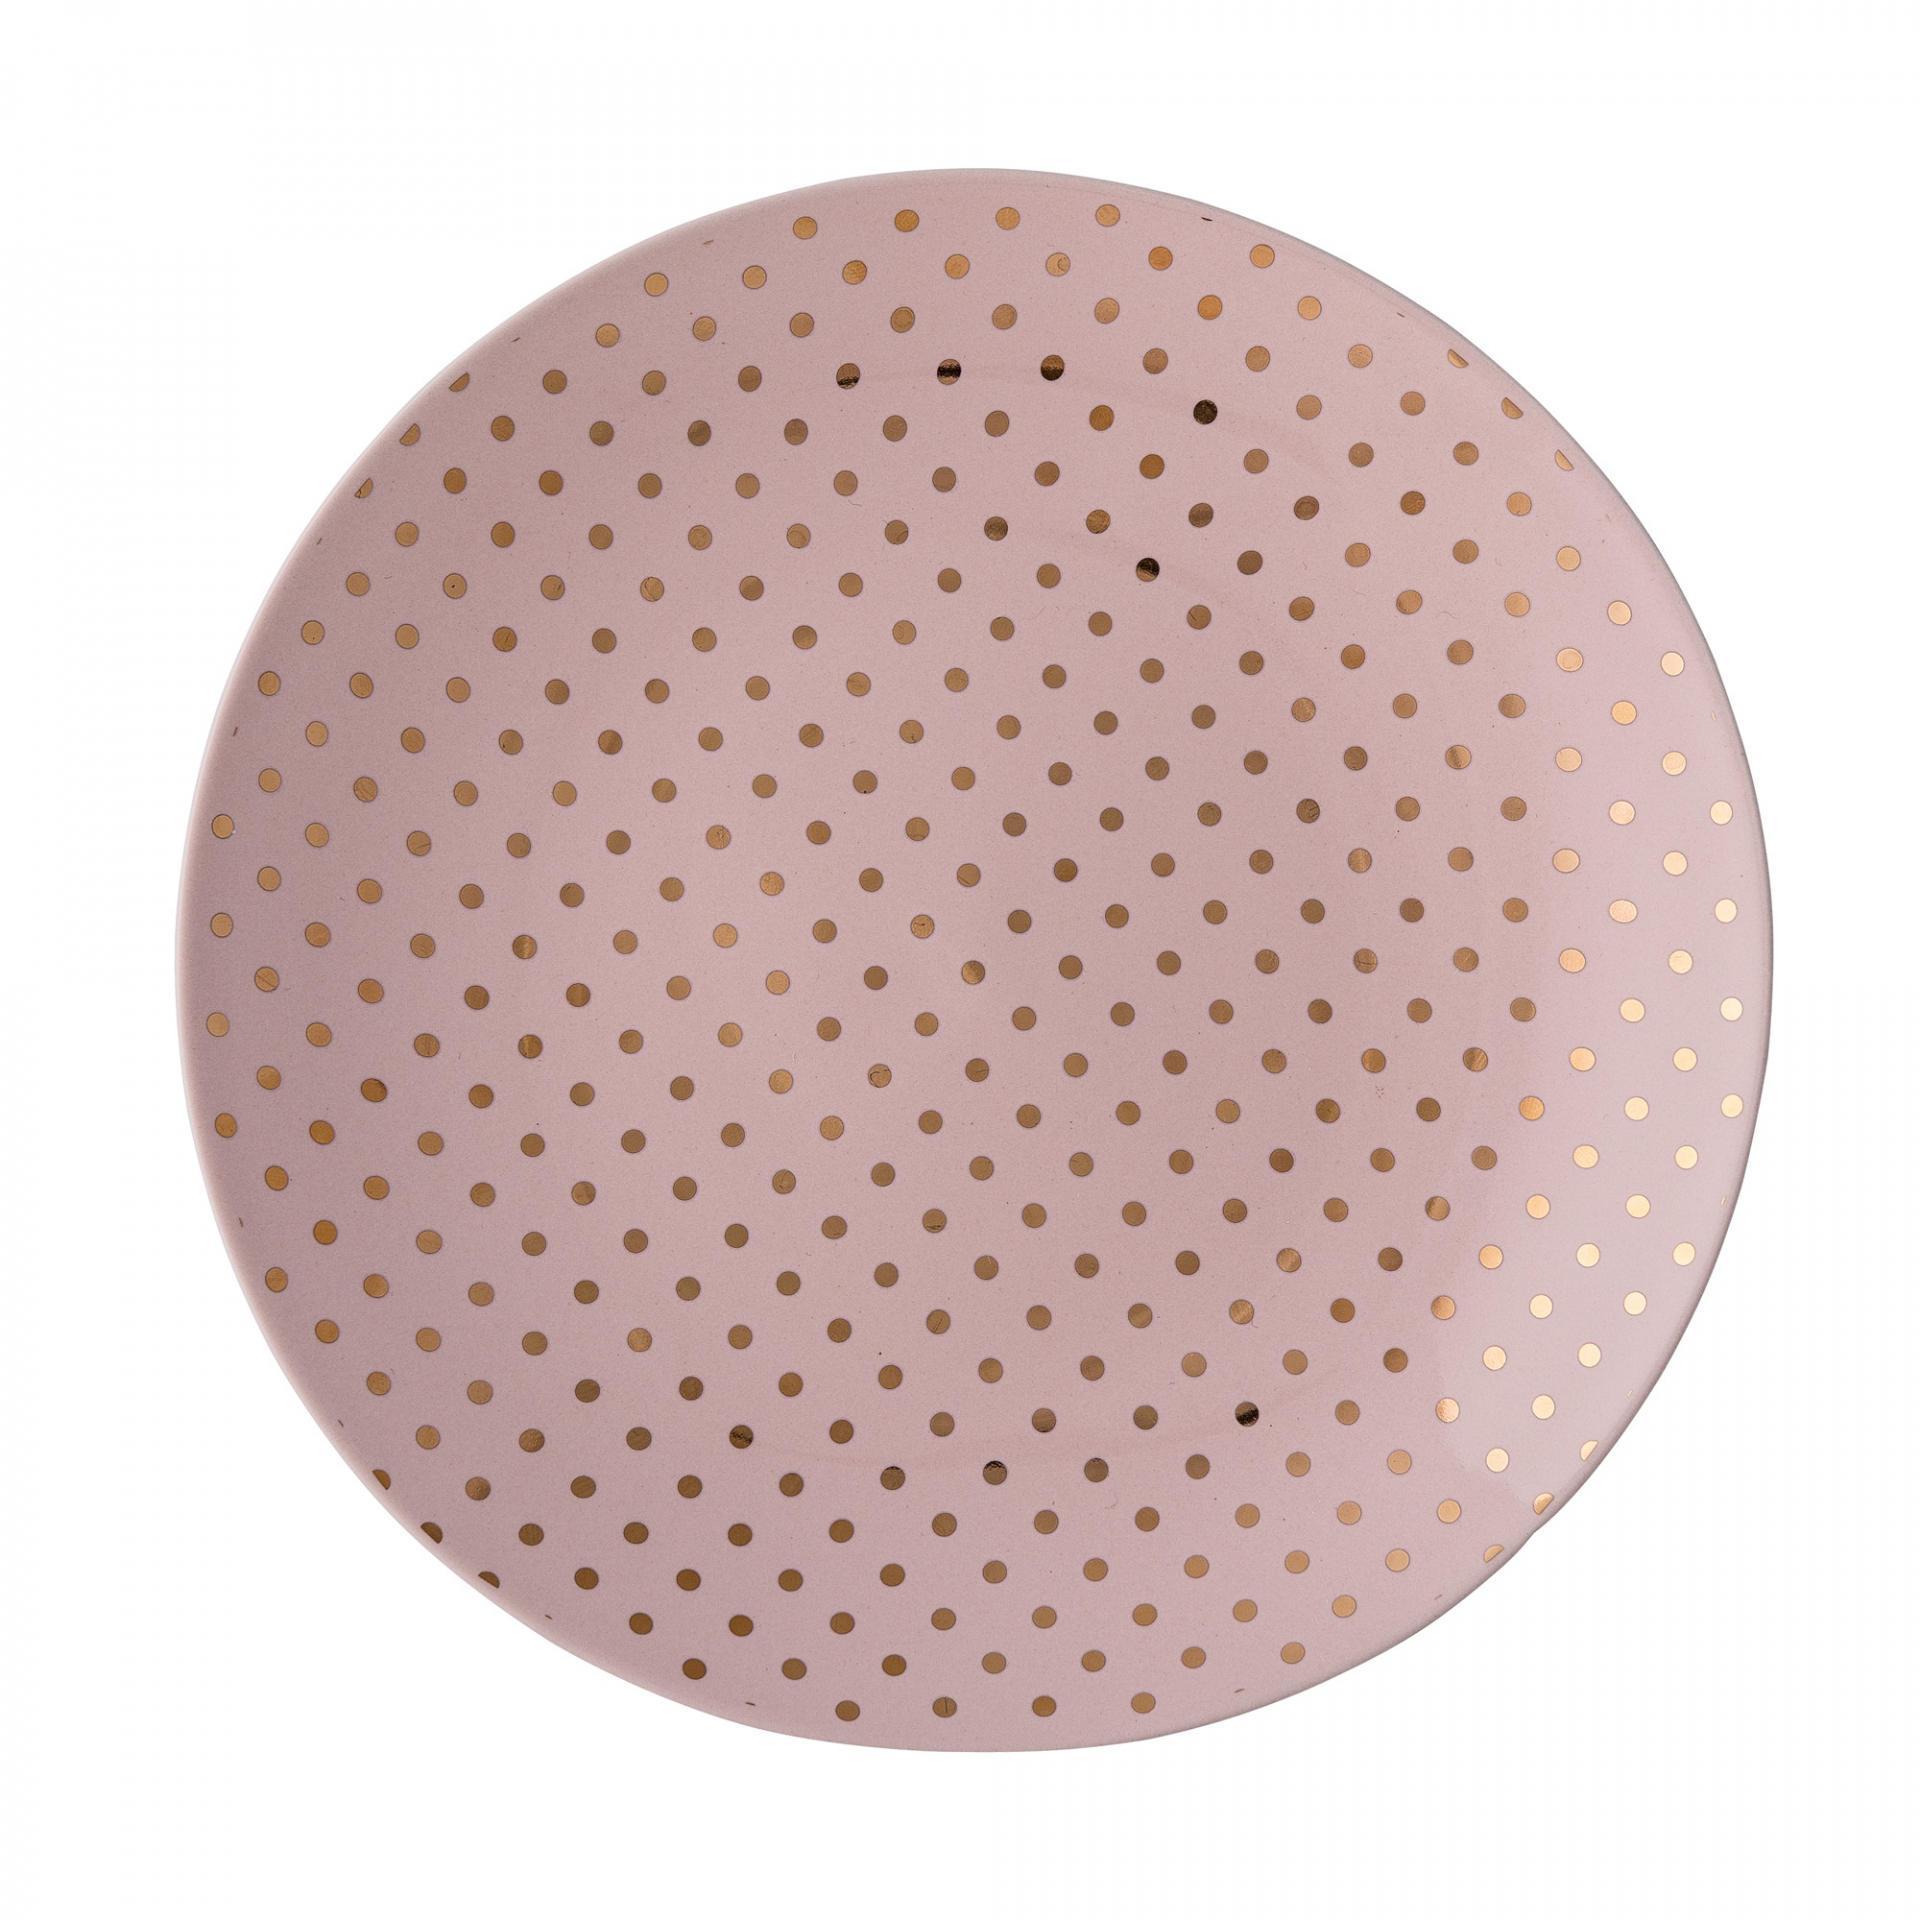 Bloomingville Dezertní talíř Henrietta Gold dots, růžová barva, zlatá barva, keramika 20 cm